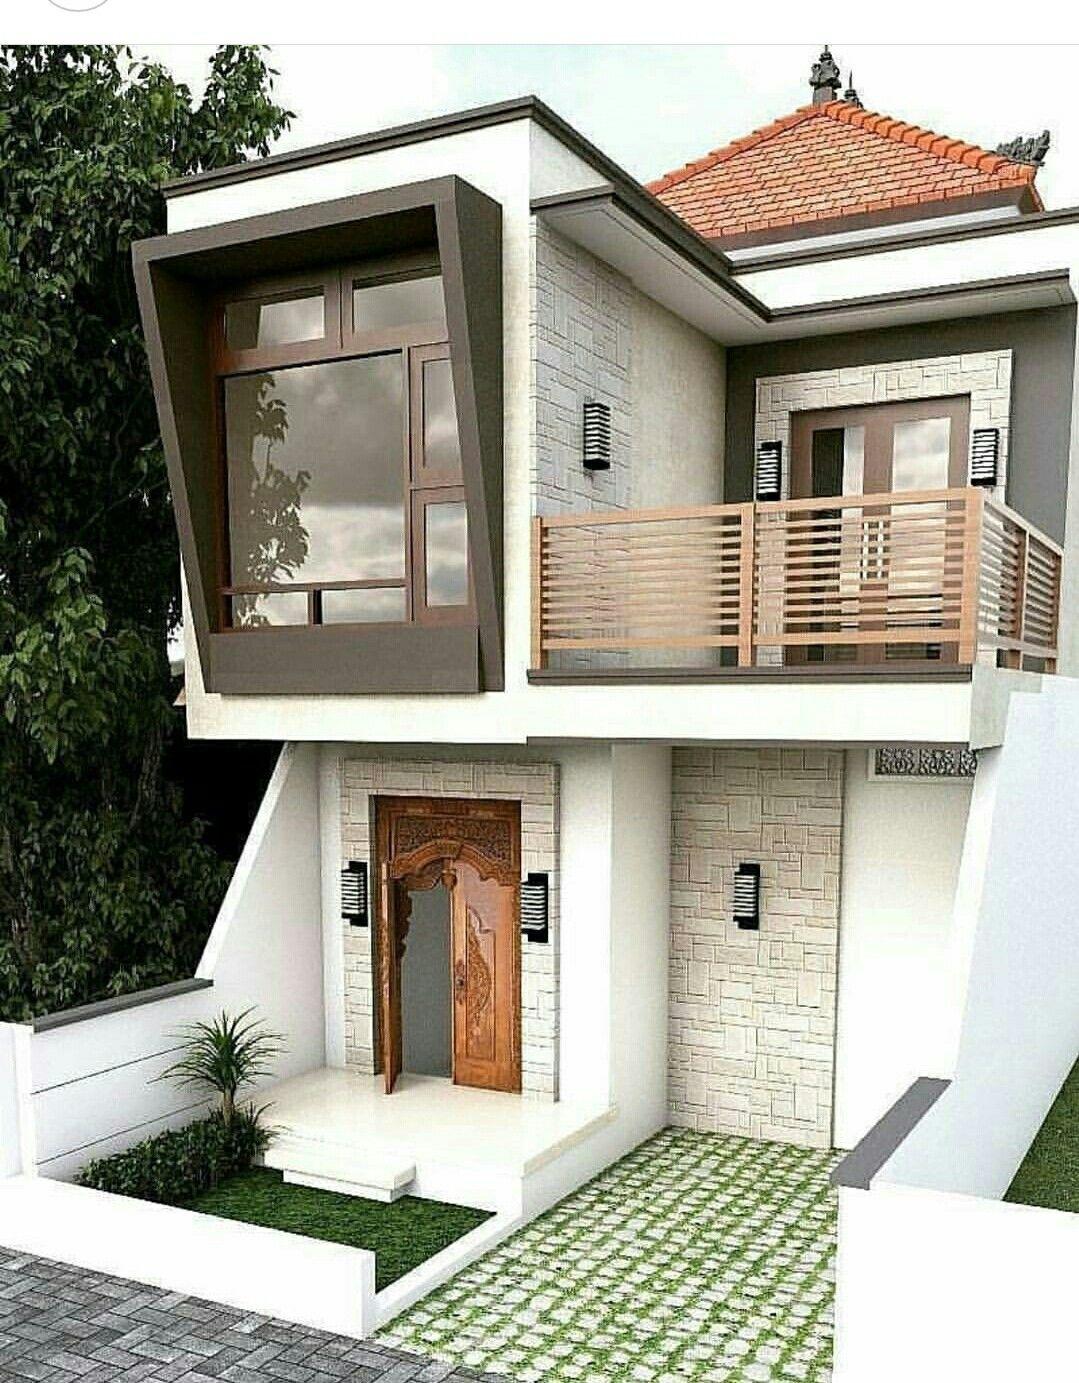 49 Most Popular Modern Dream House Exterior Design Ideas 3 In 2020: House Design, House Plans, Modern House Design